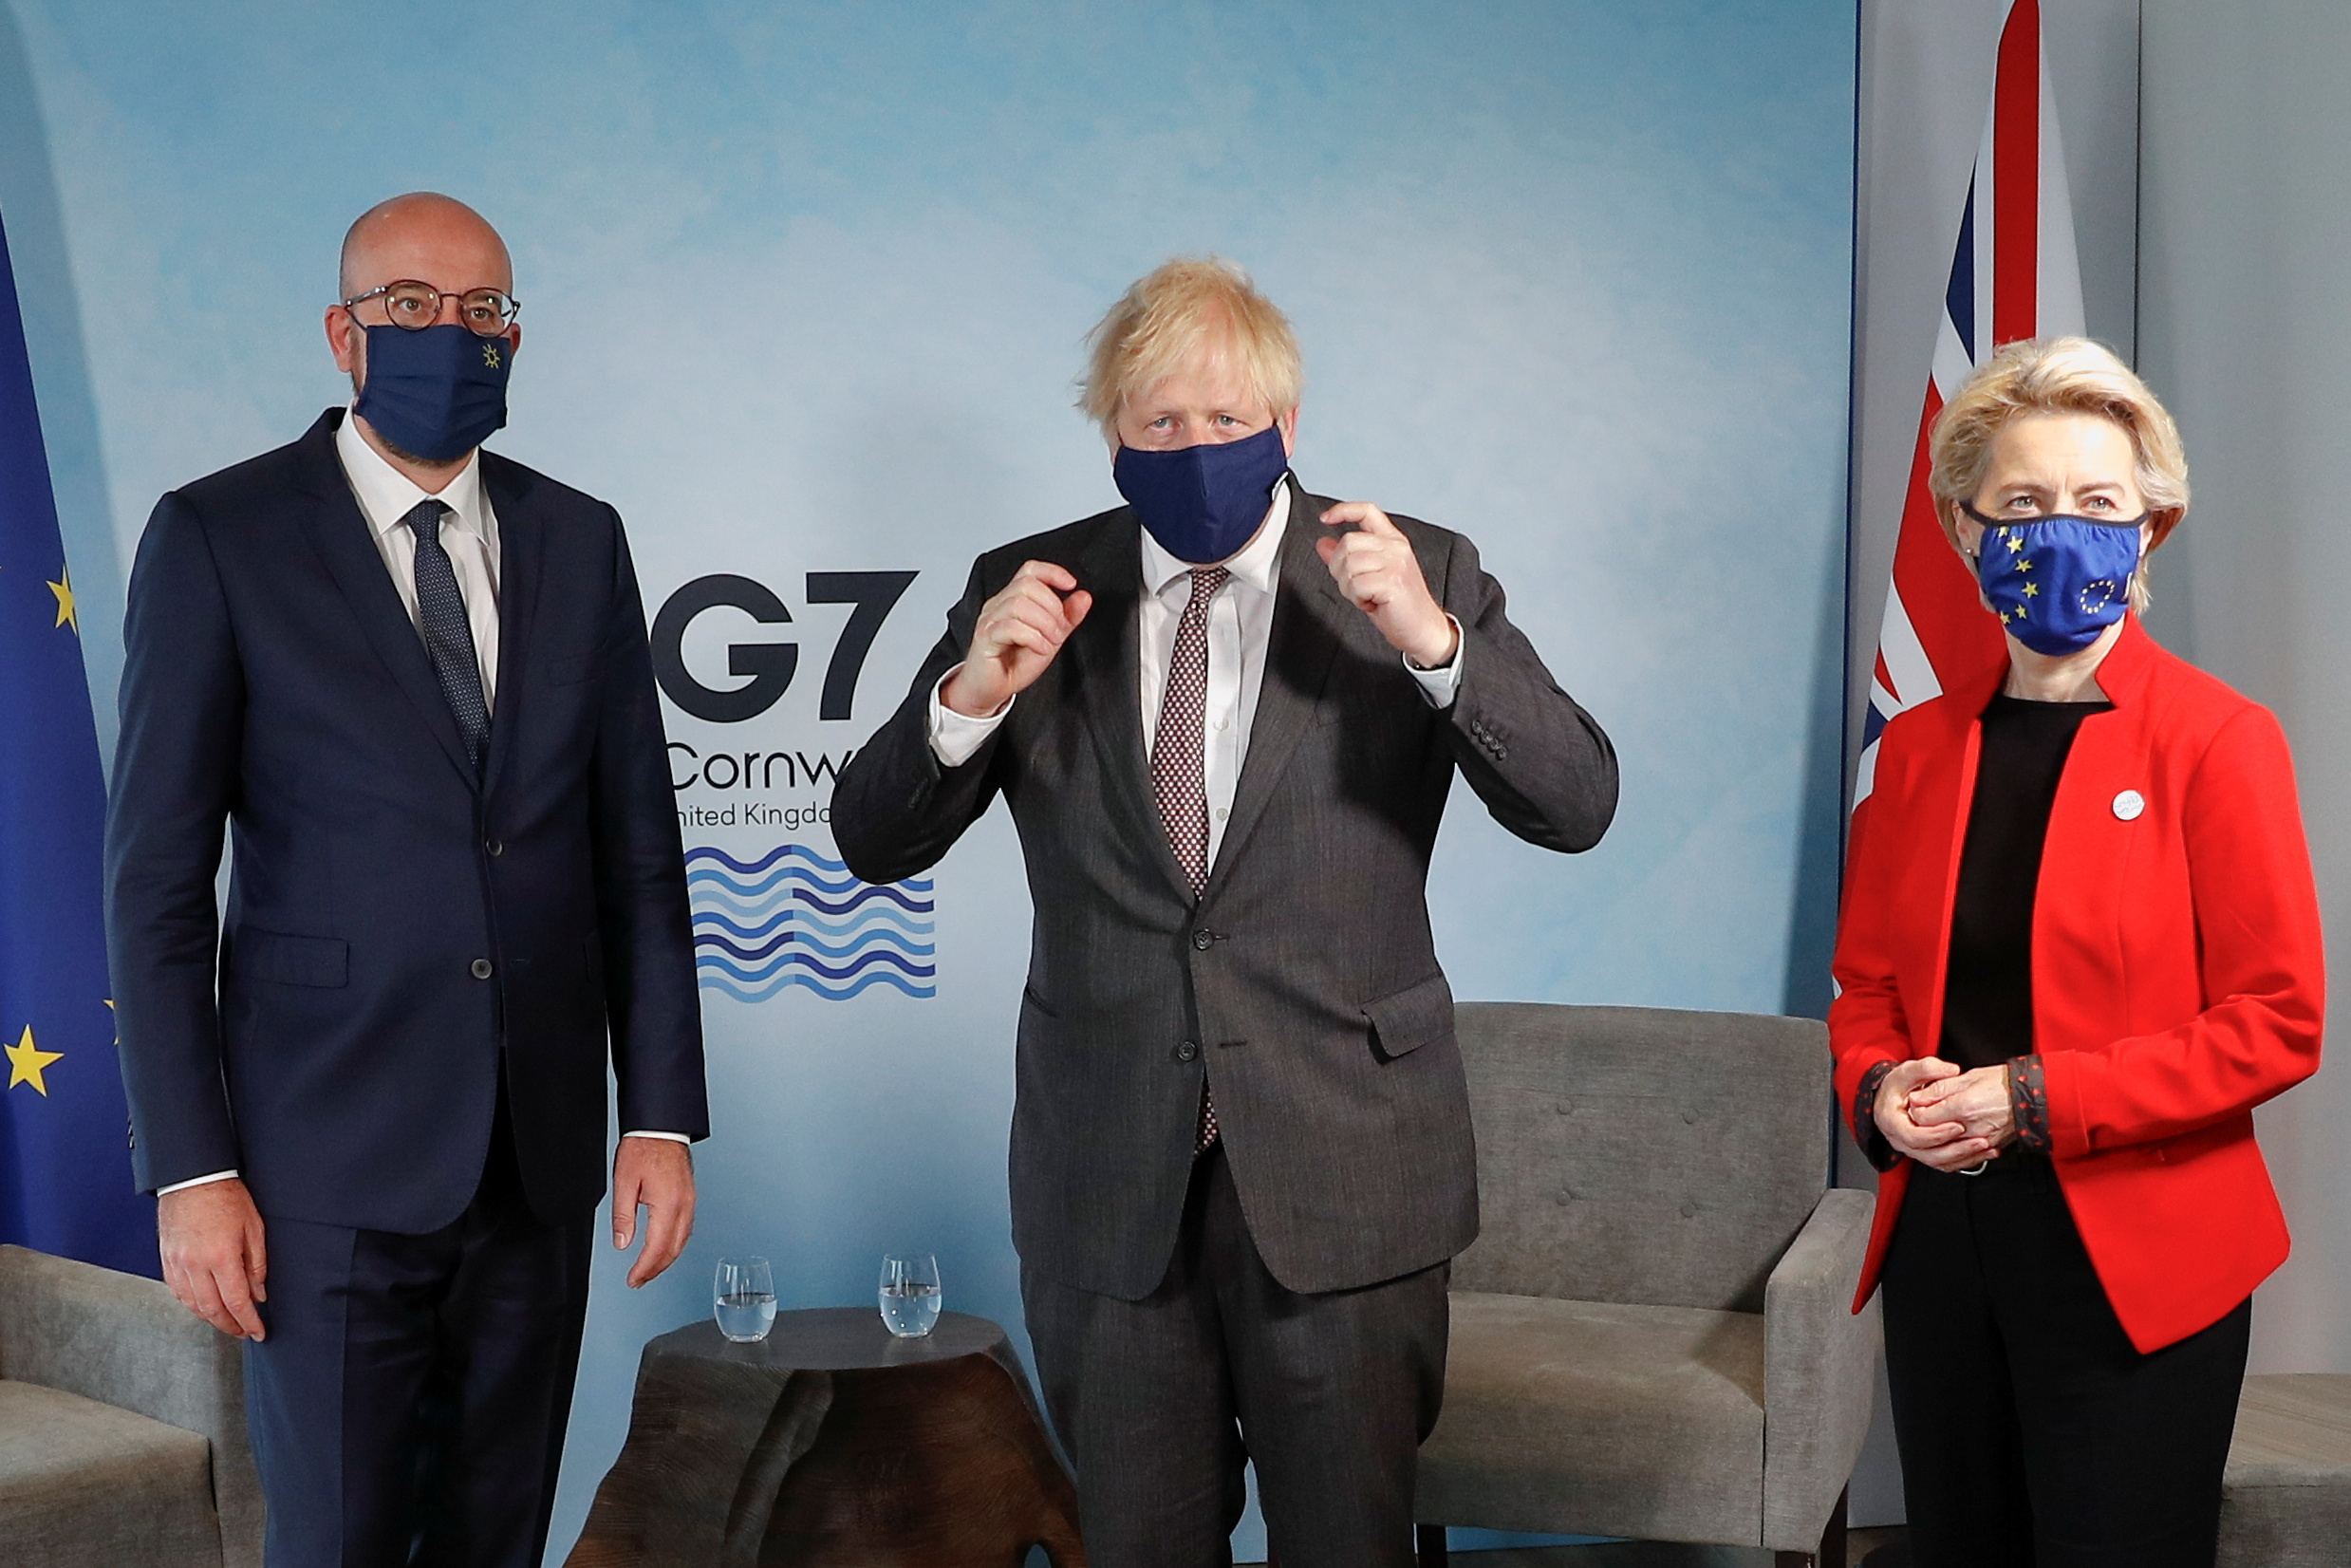 G7: Ο Τζόνσον ζητά «συμβιβασμό» από τους Ευρωπαίους ηγέτες για τη Βόρεια Ιρλανδία